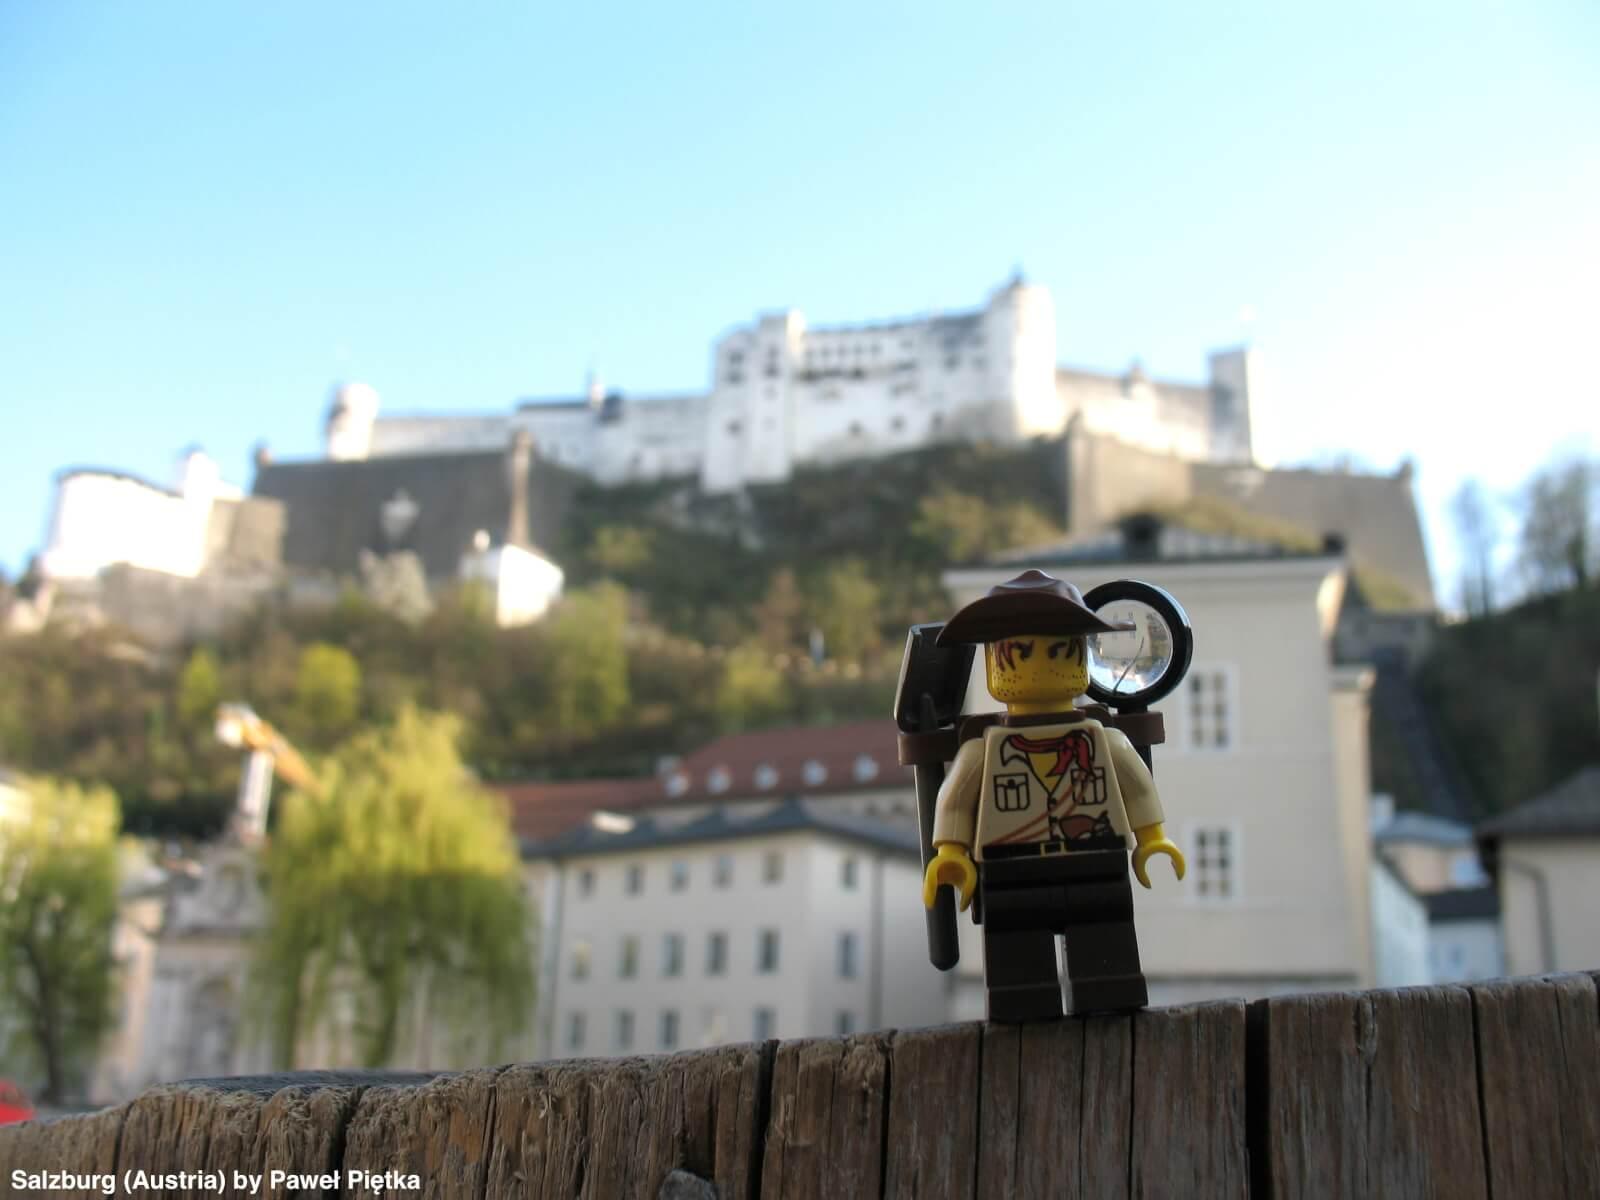 Salzburg (Austria) - Hohensalzburg Fortress